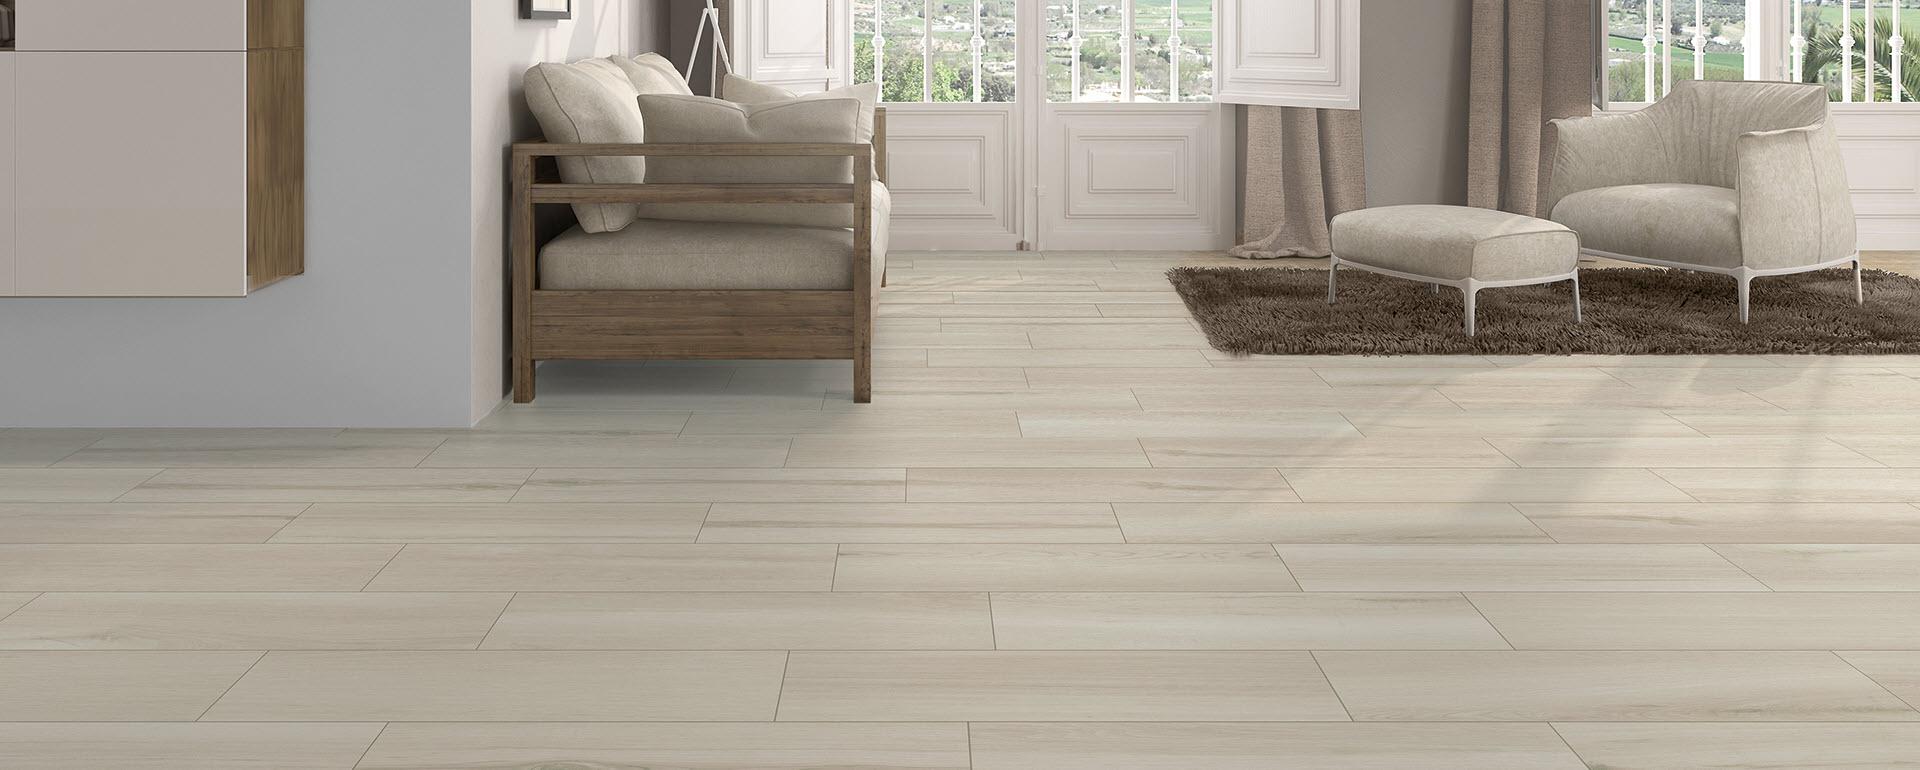 Timber Blanco Porcelain Tile 9x30